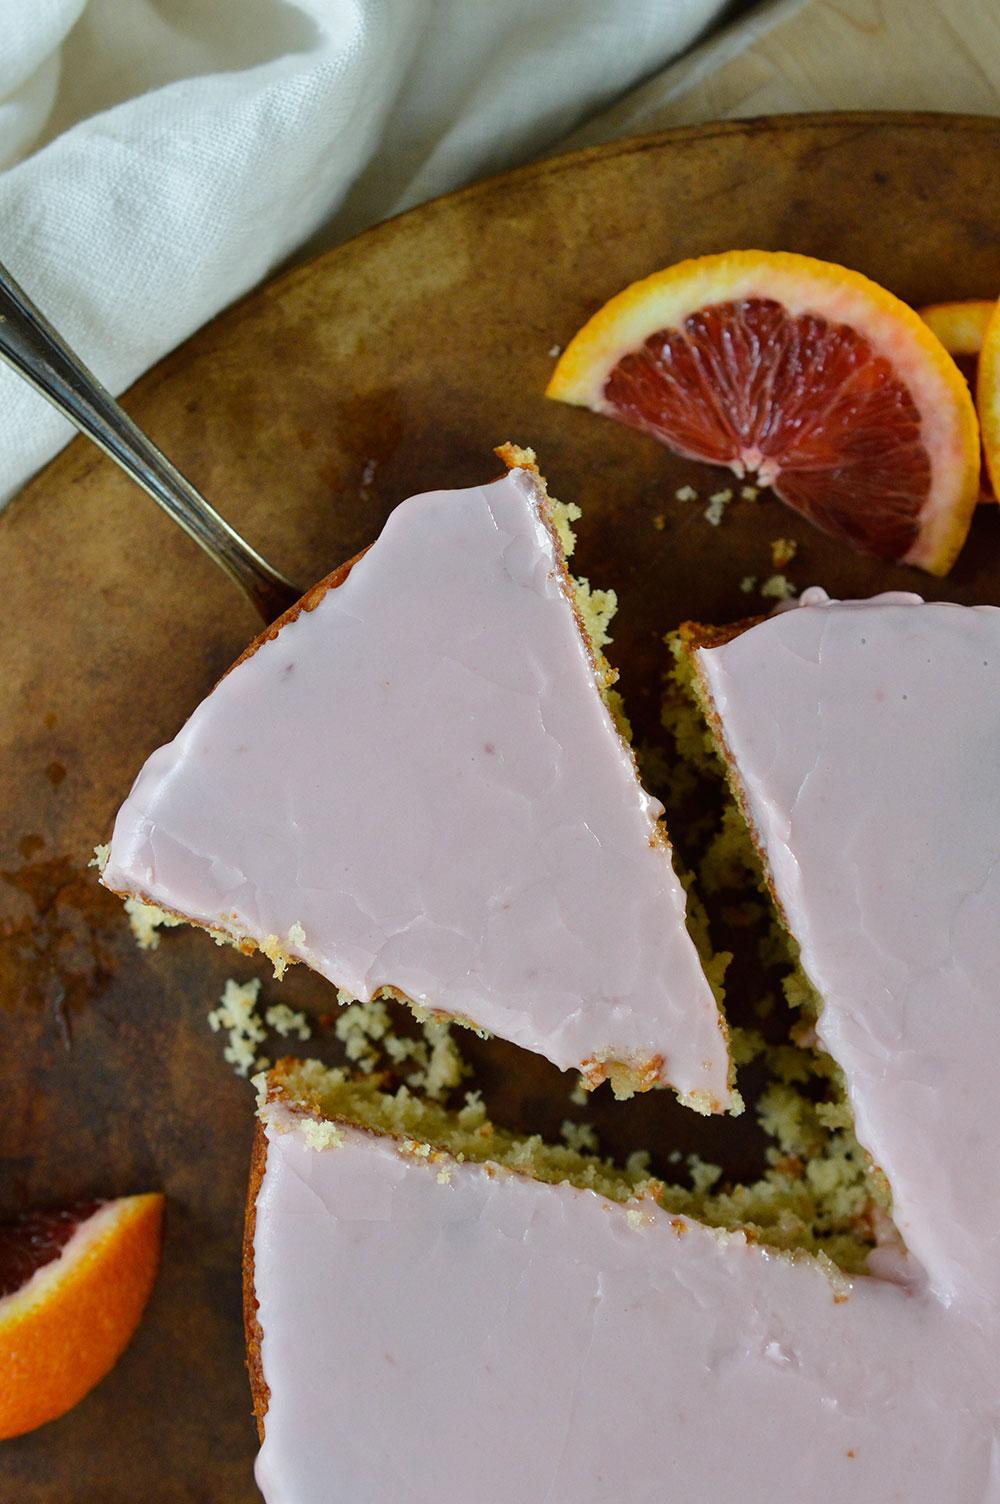 Blood Orange Cake Recipe with Blood Orange Glaze. This easy cake recipe is a beautiful dessert with mild orange flavor.